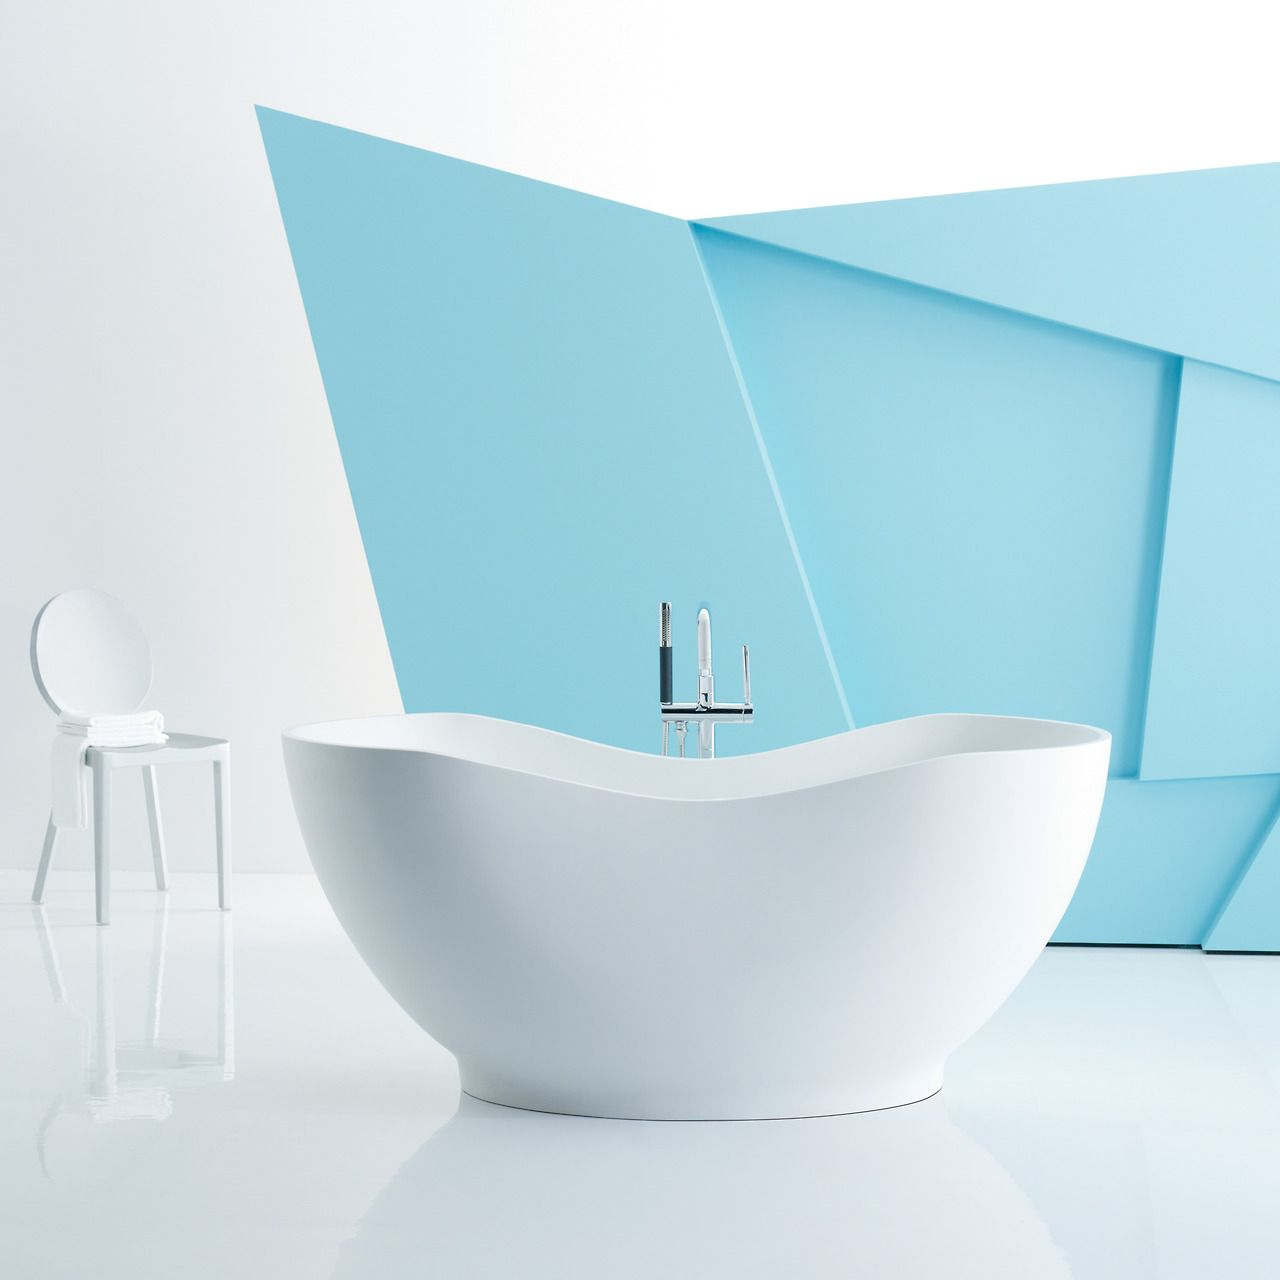 Abrazo freestanding bath | BATHROOMS | Pinterest | Freestanding bath ...